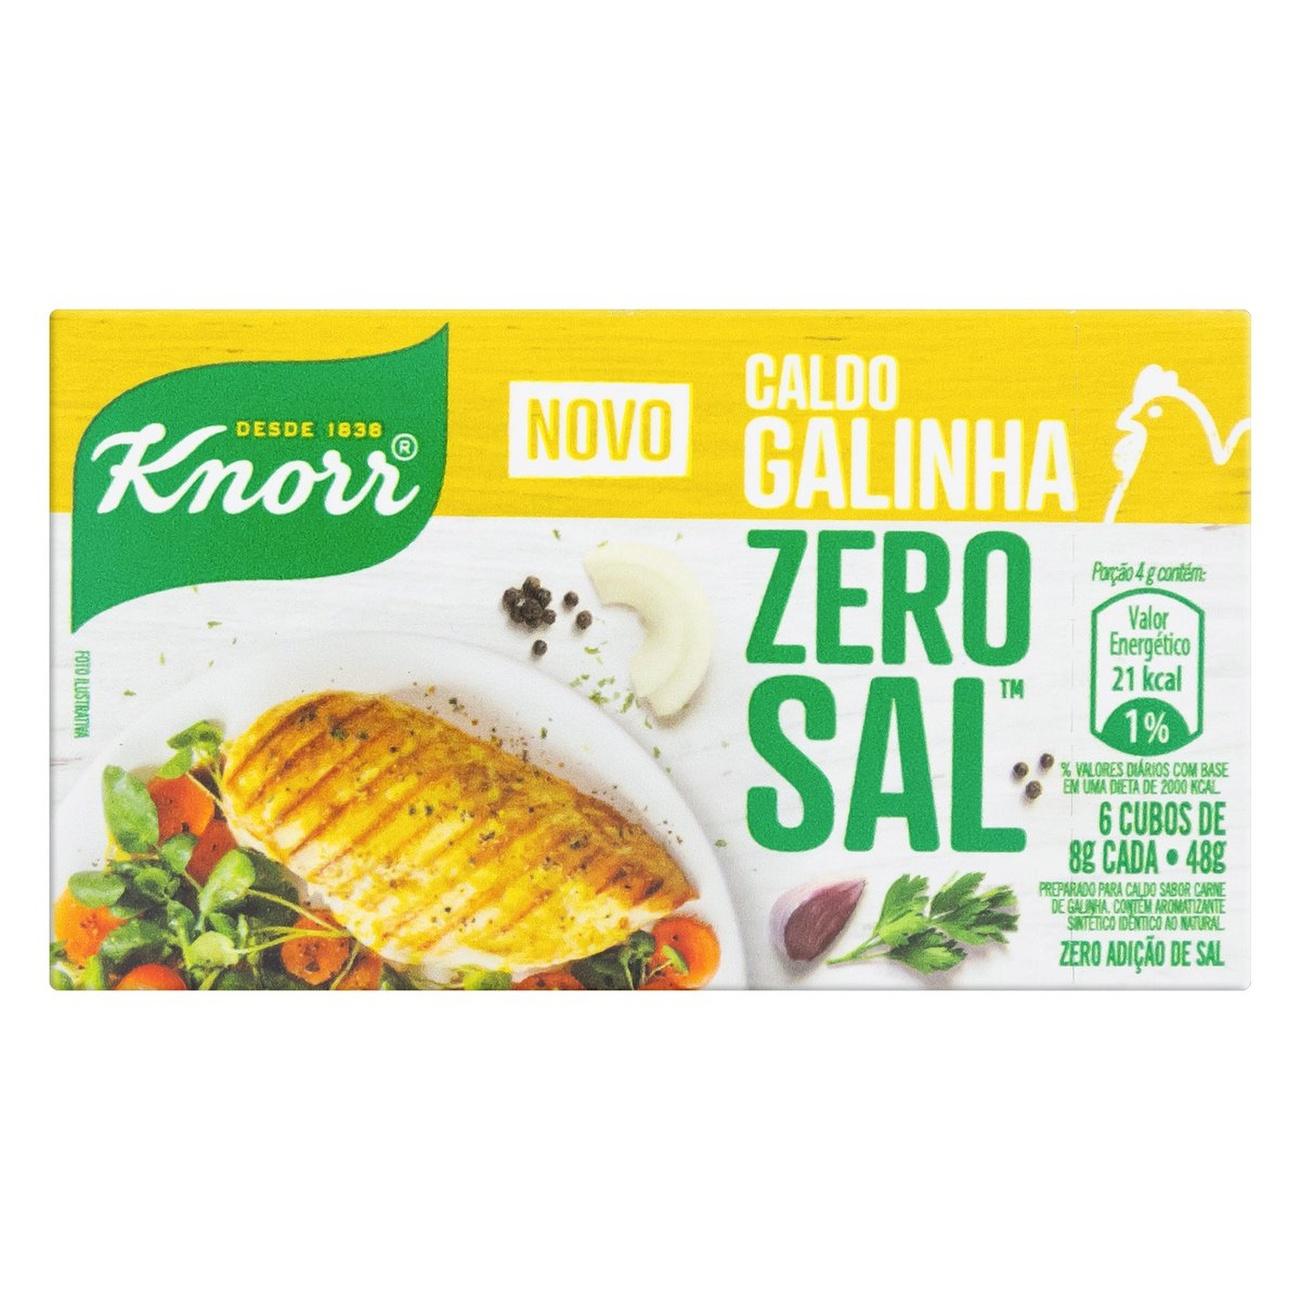 CX CALDO KNORR ZERO SAL GALINHA1X48G(160